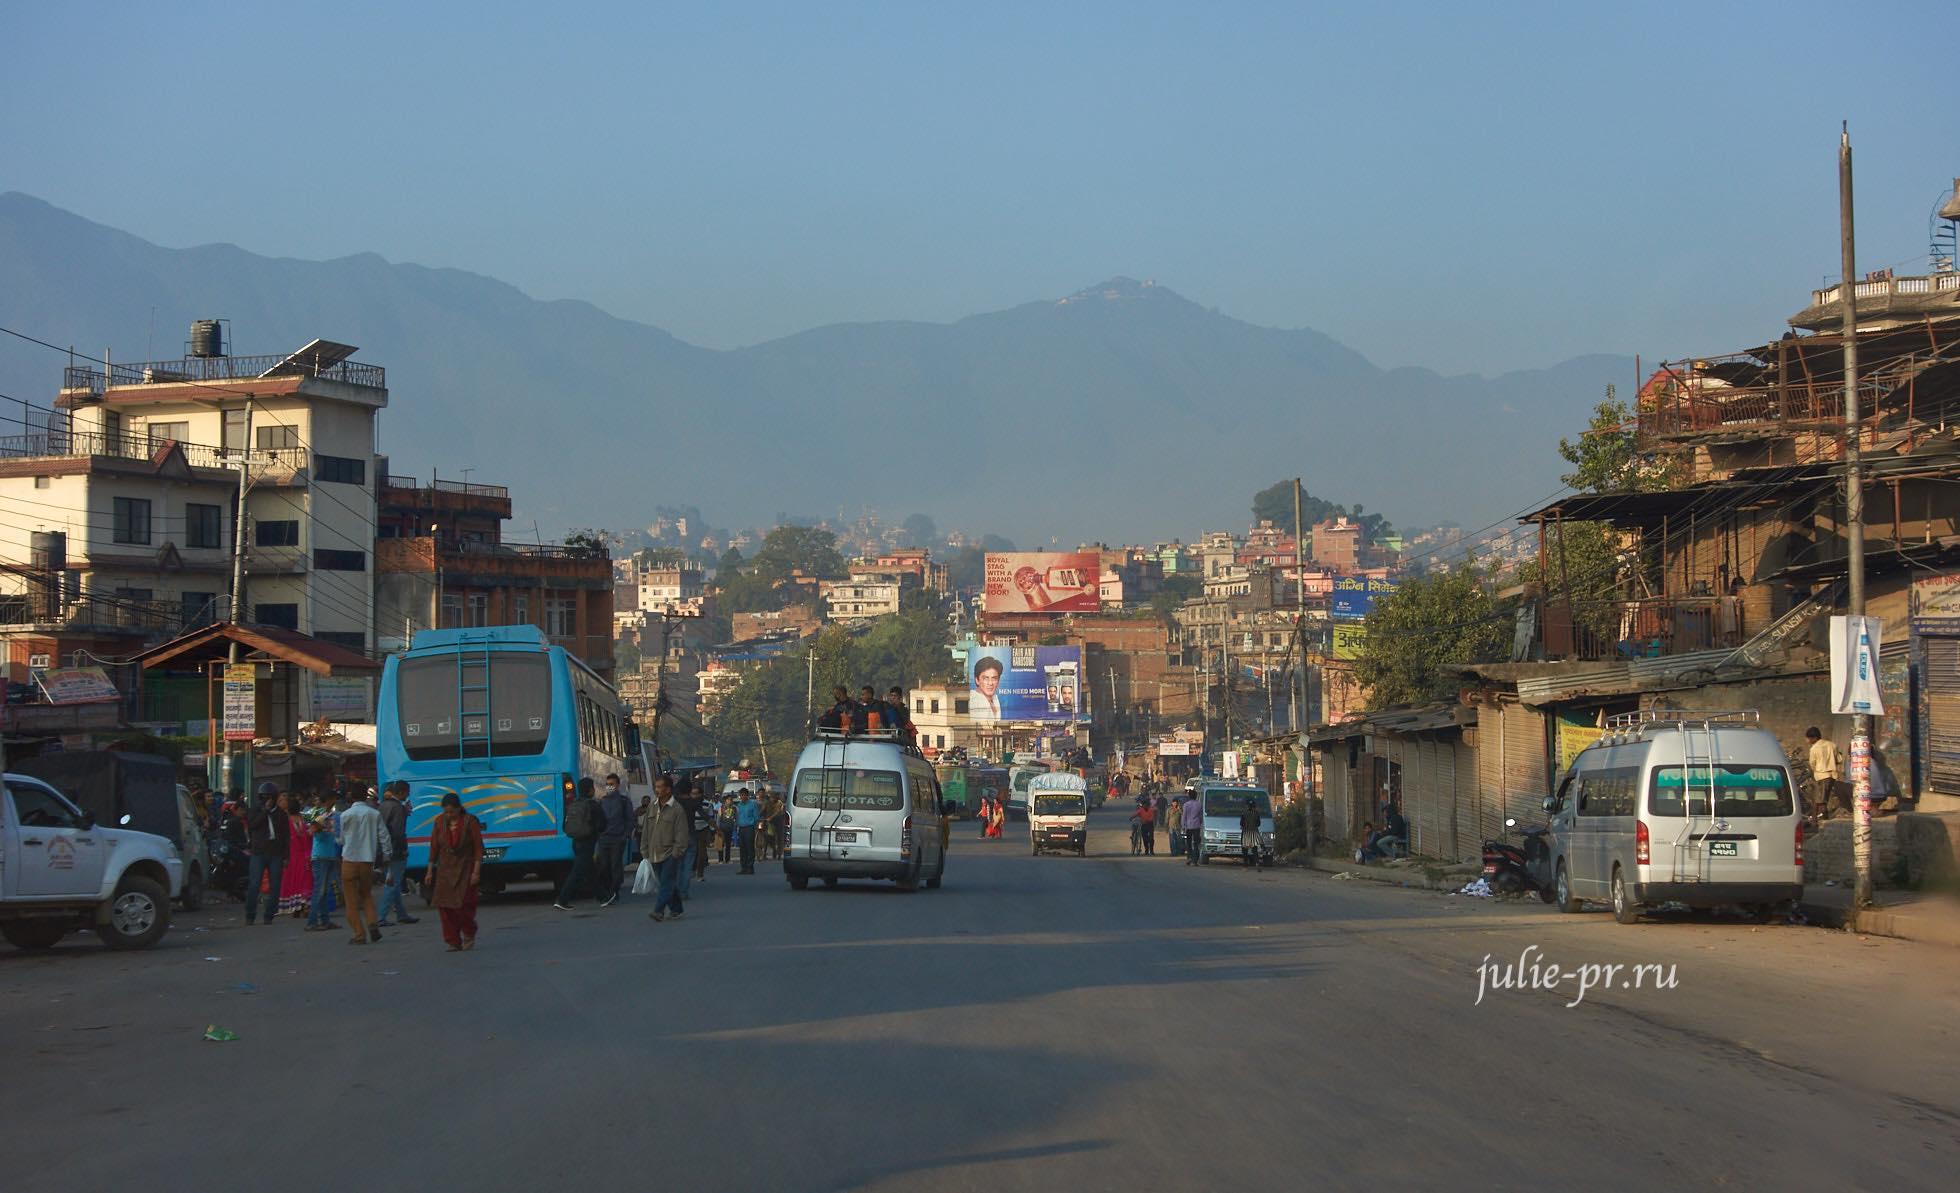 Непал, Катманду, дорога